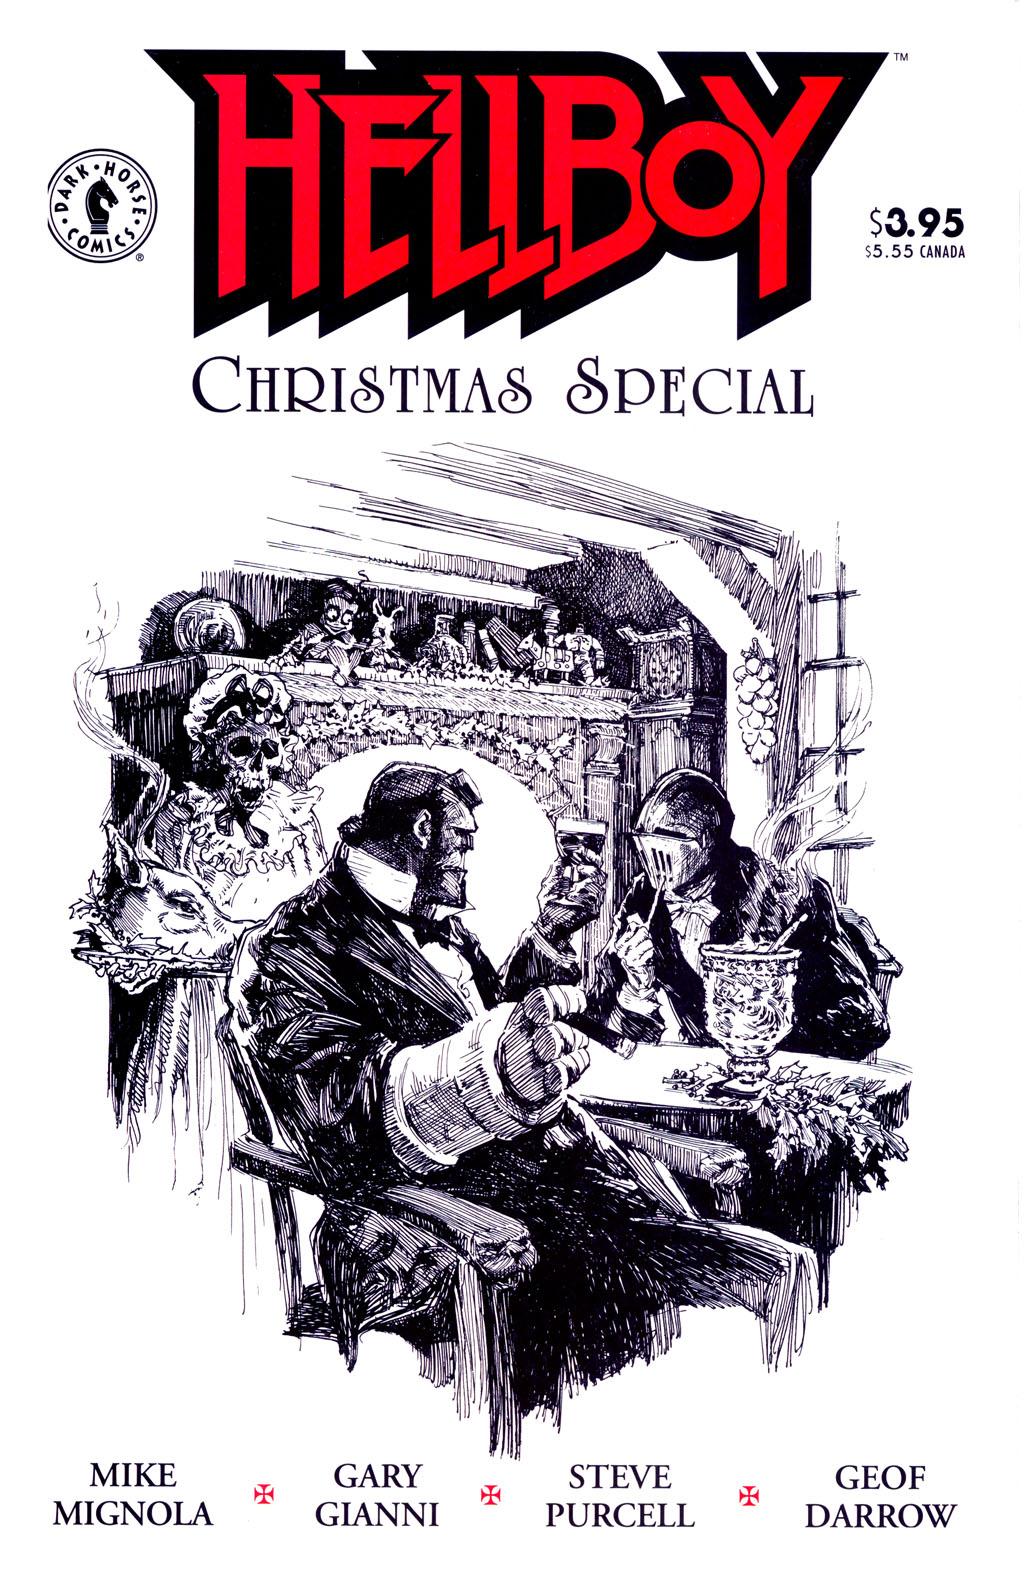 A Christmas Underground